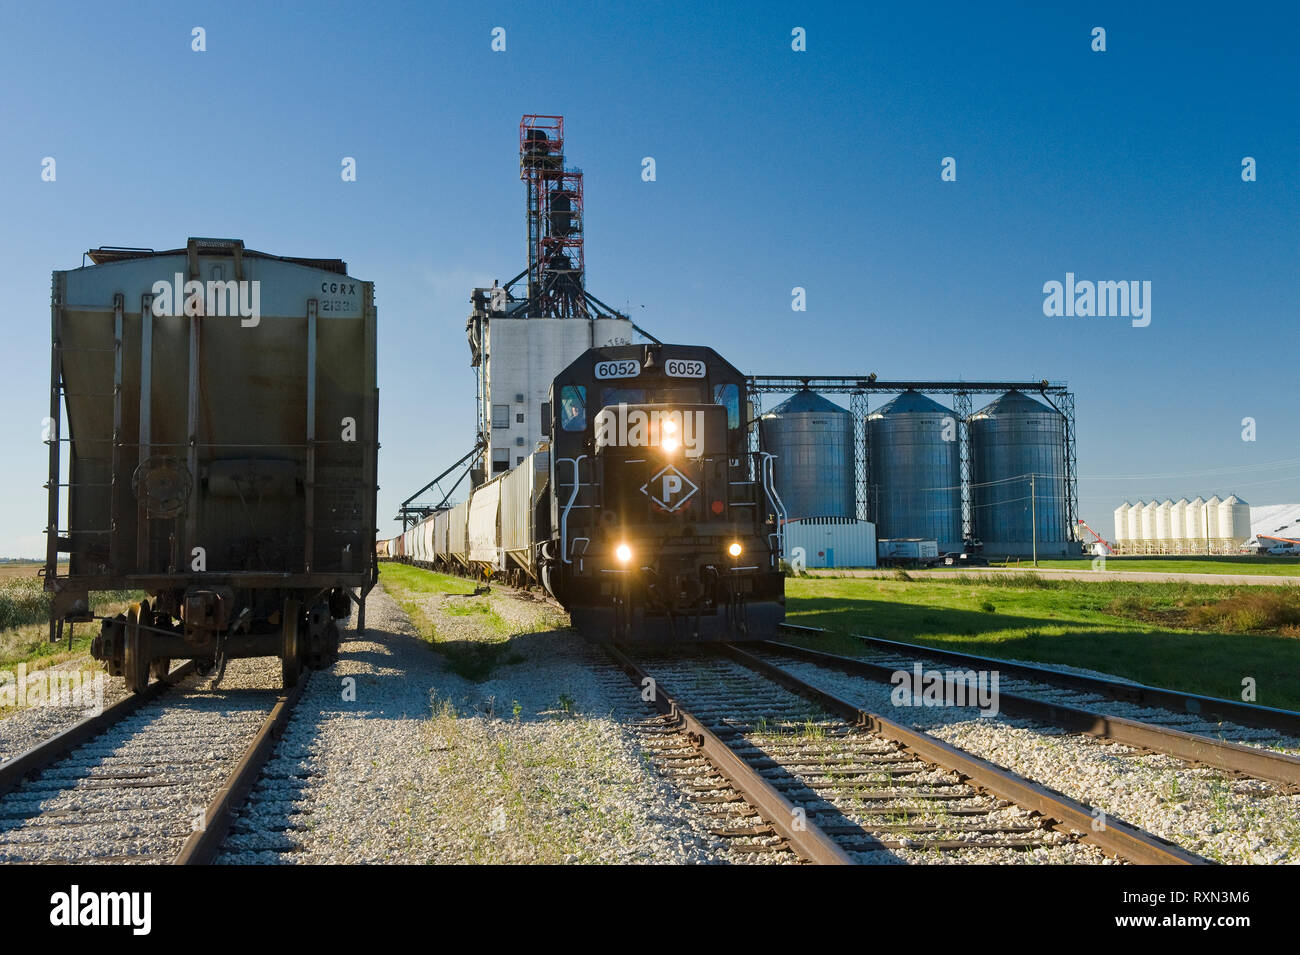 locomotive with rail hopper cars at an inland grain terminal, near Winnipeg, Manitoba, Canada Stock Photo